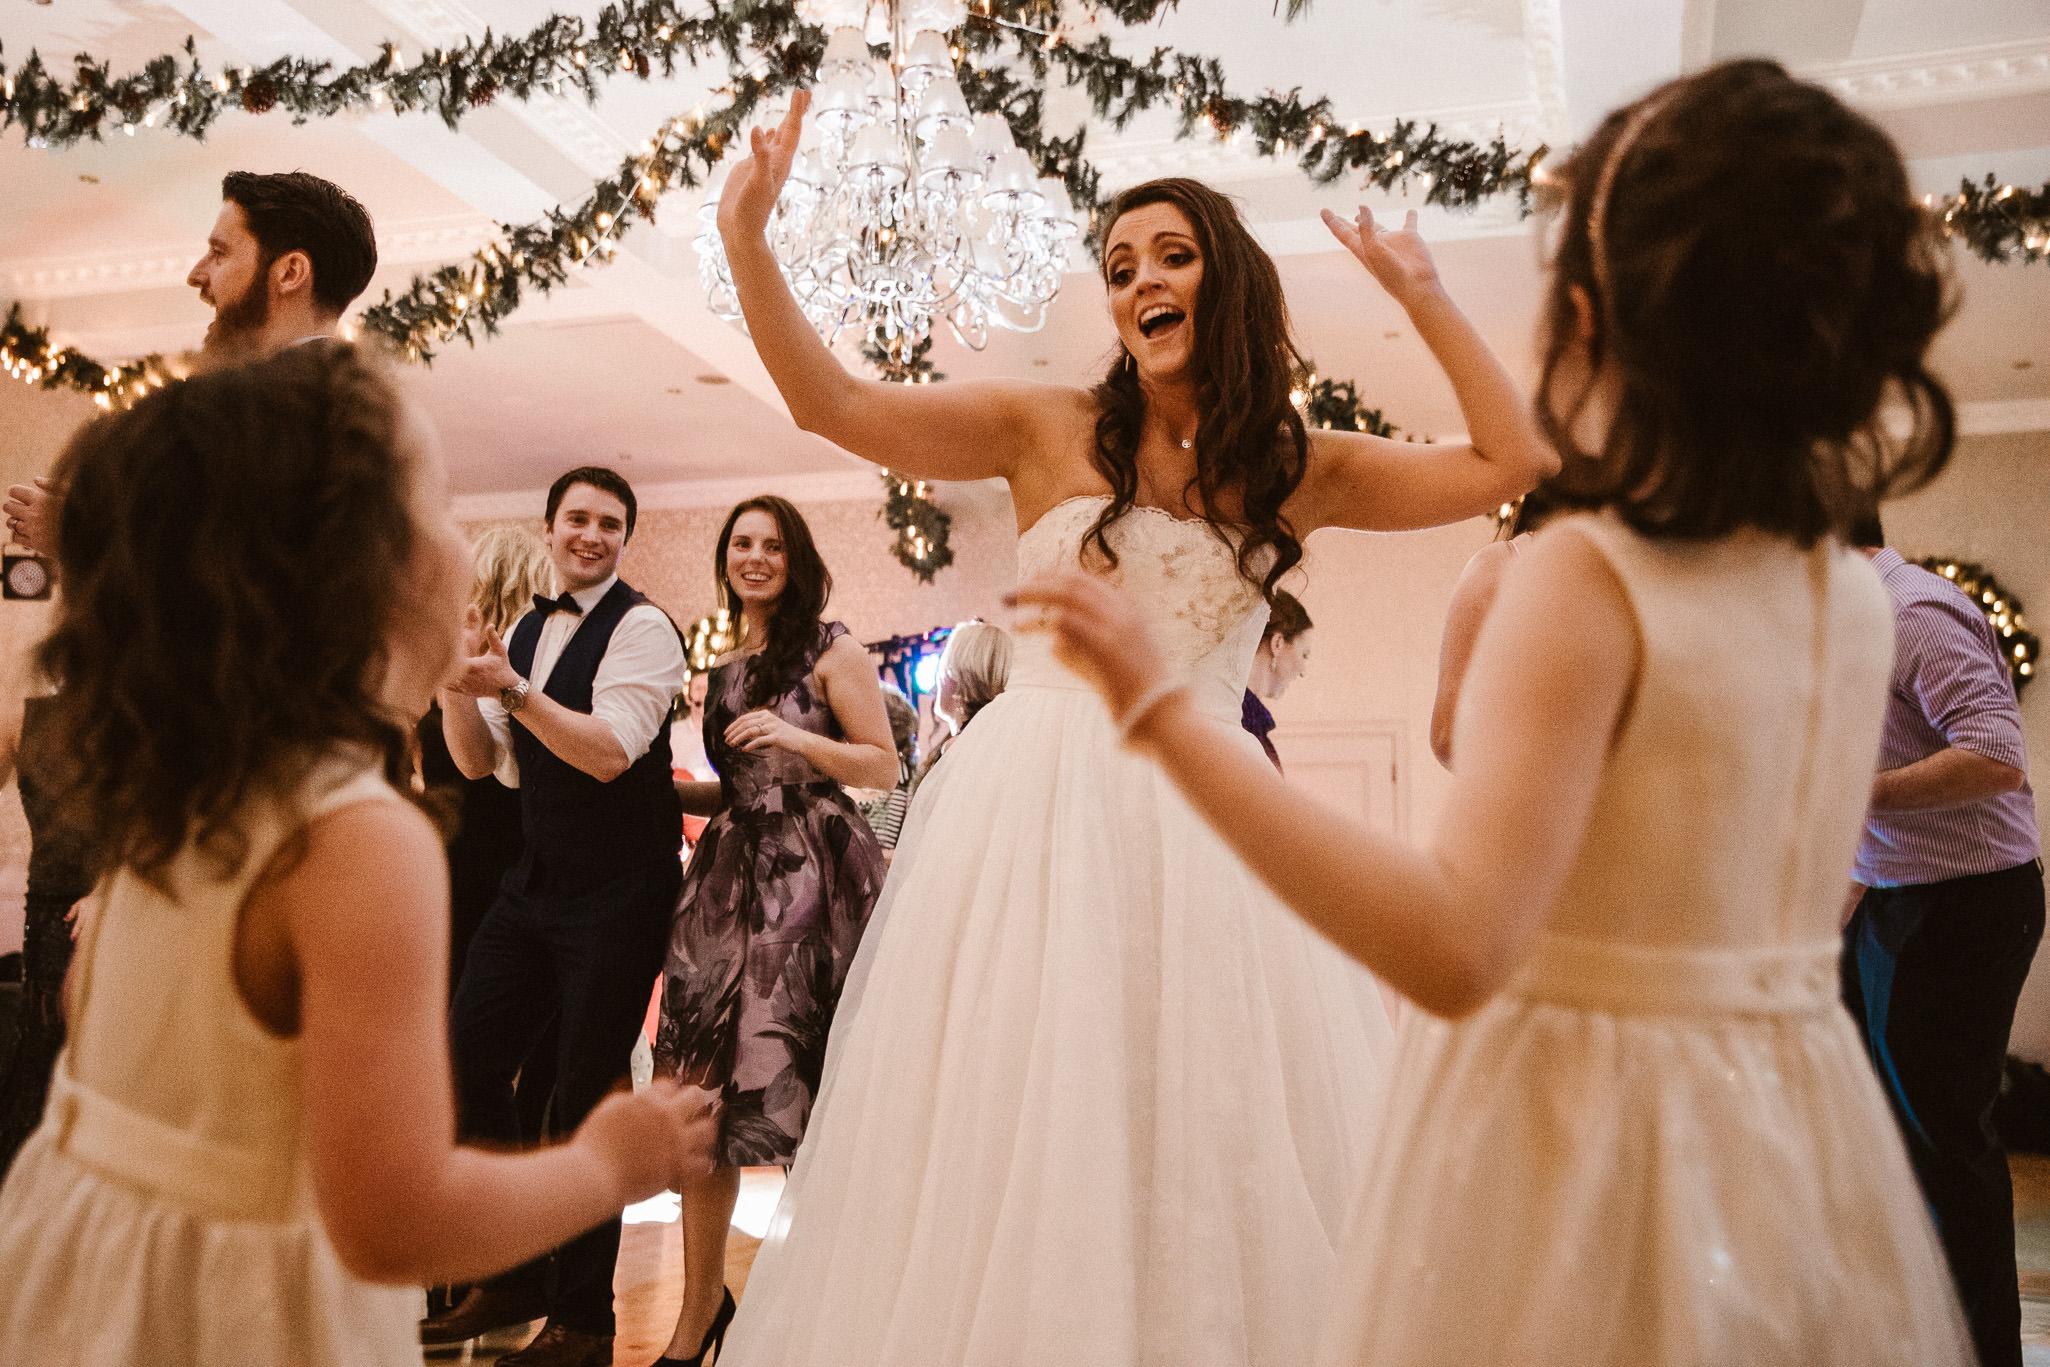 clairebyrnephotography-wedding-night-sparklers-new-years-eve-denyce-leonard-24.jpg